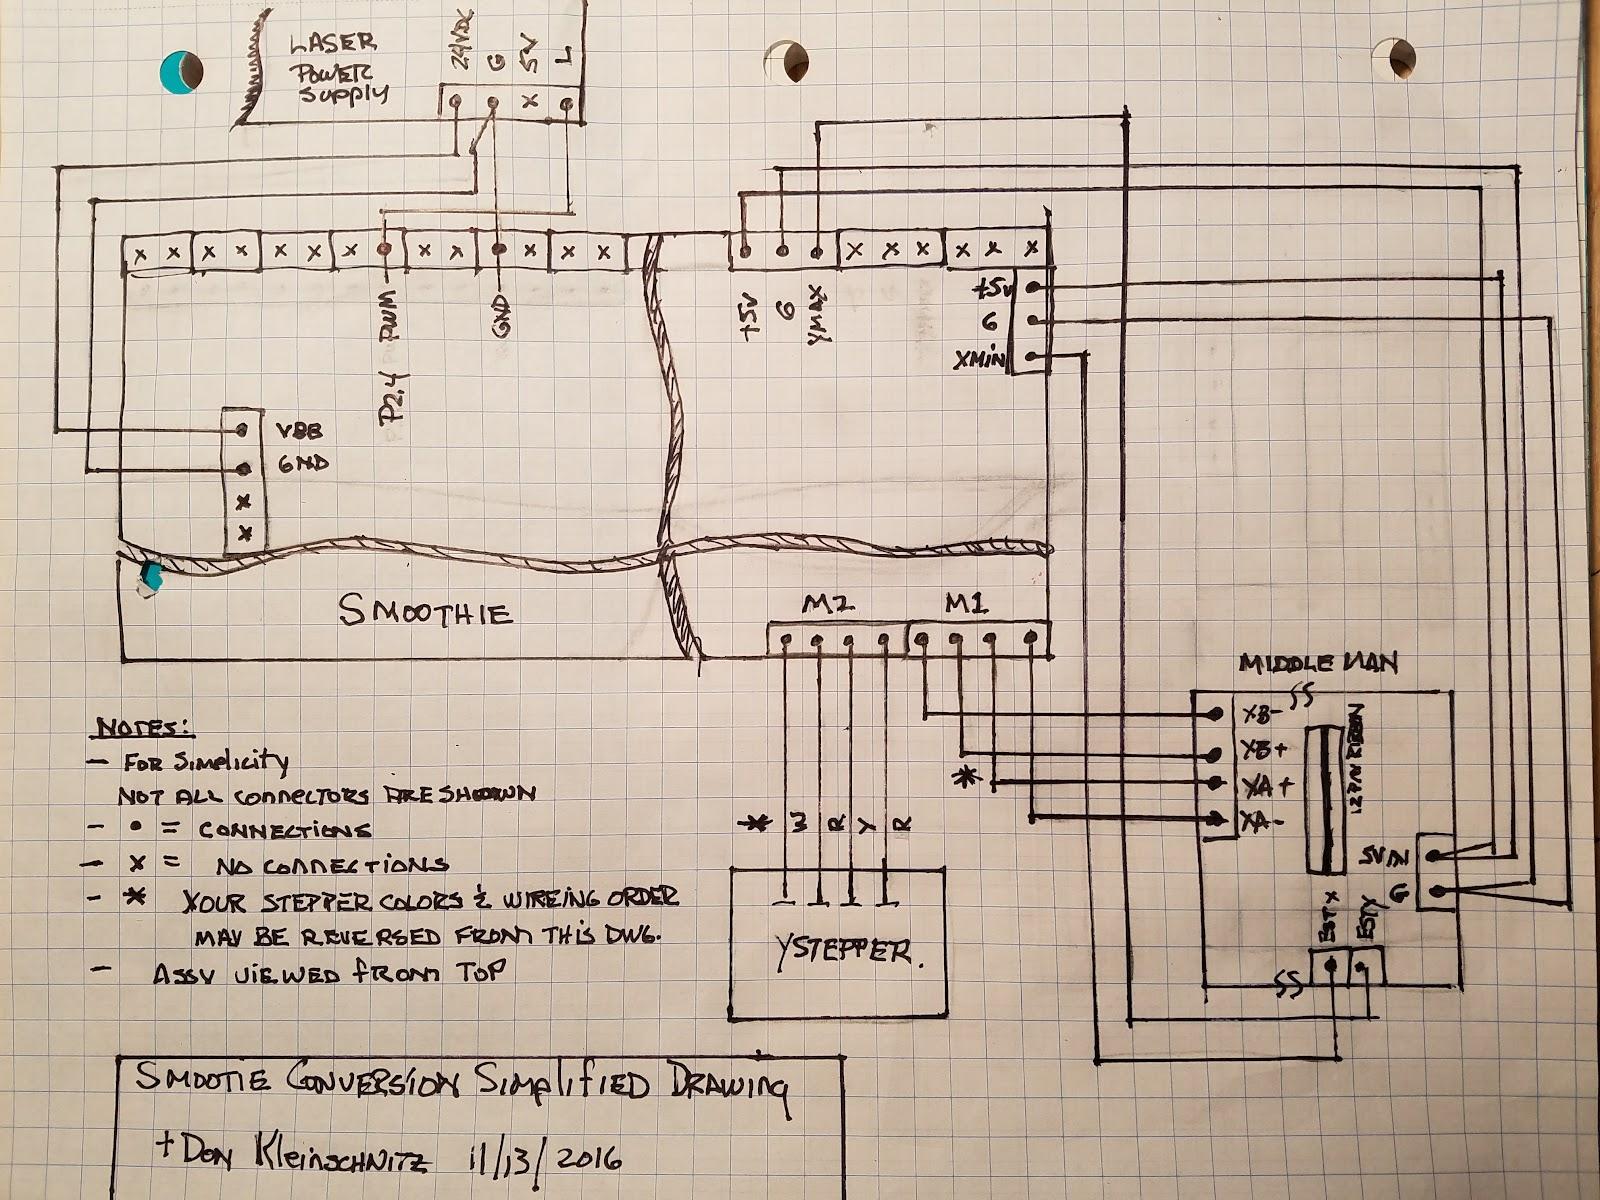 hight resolution of k40 fuse diagram wiring diagramk40 fuse diagram wiring diagram lapk40 fuse diagram wiring diagram database fuse